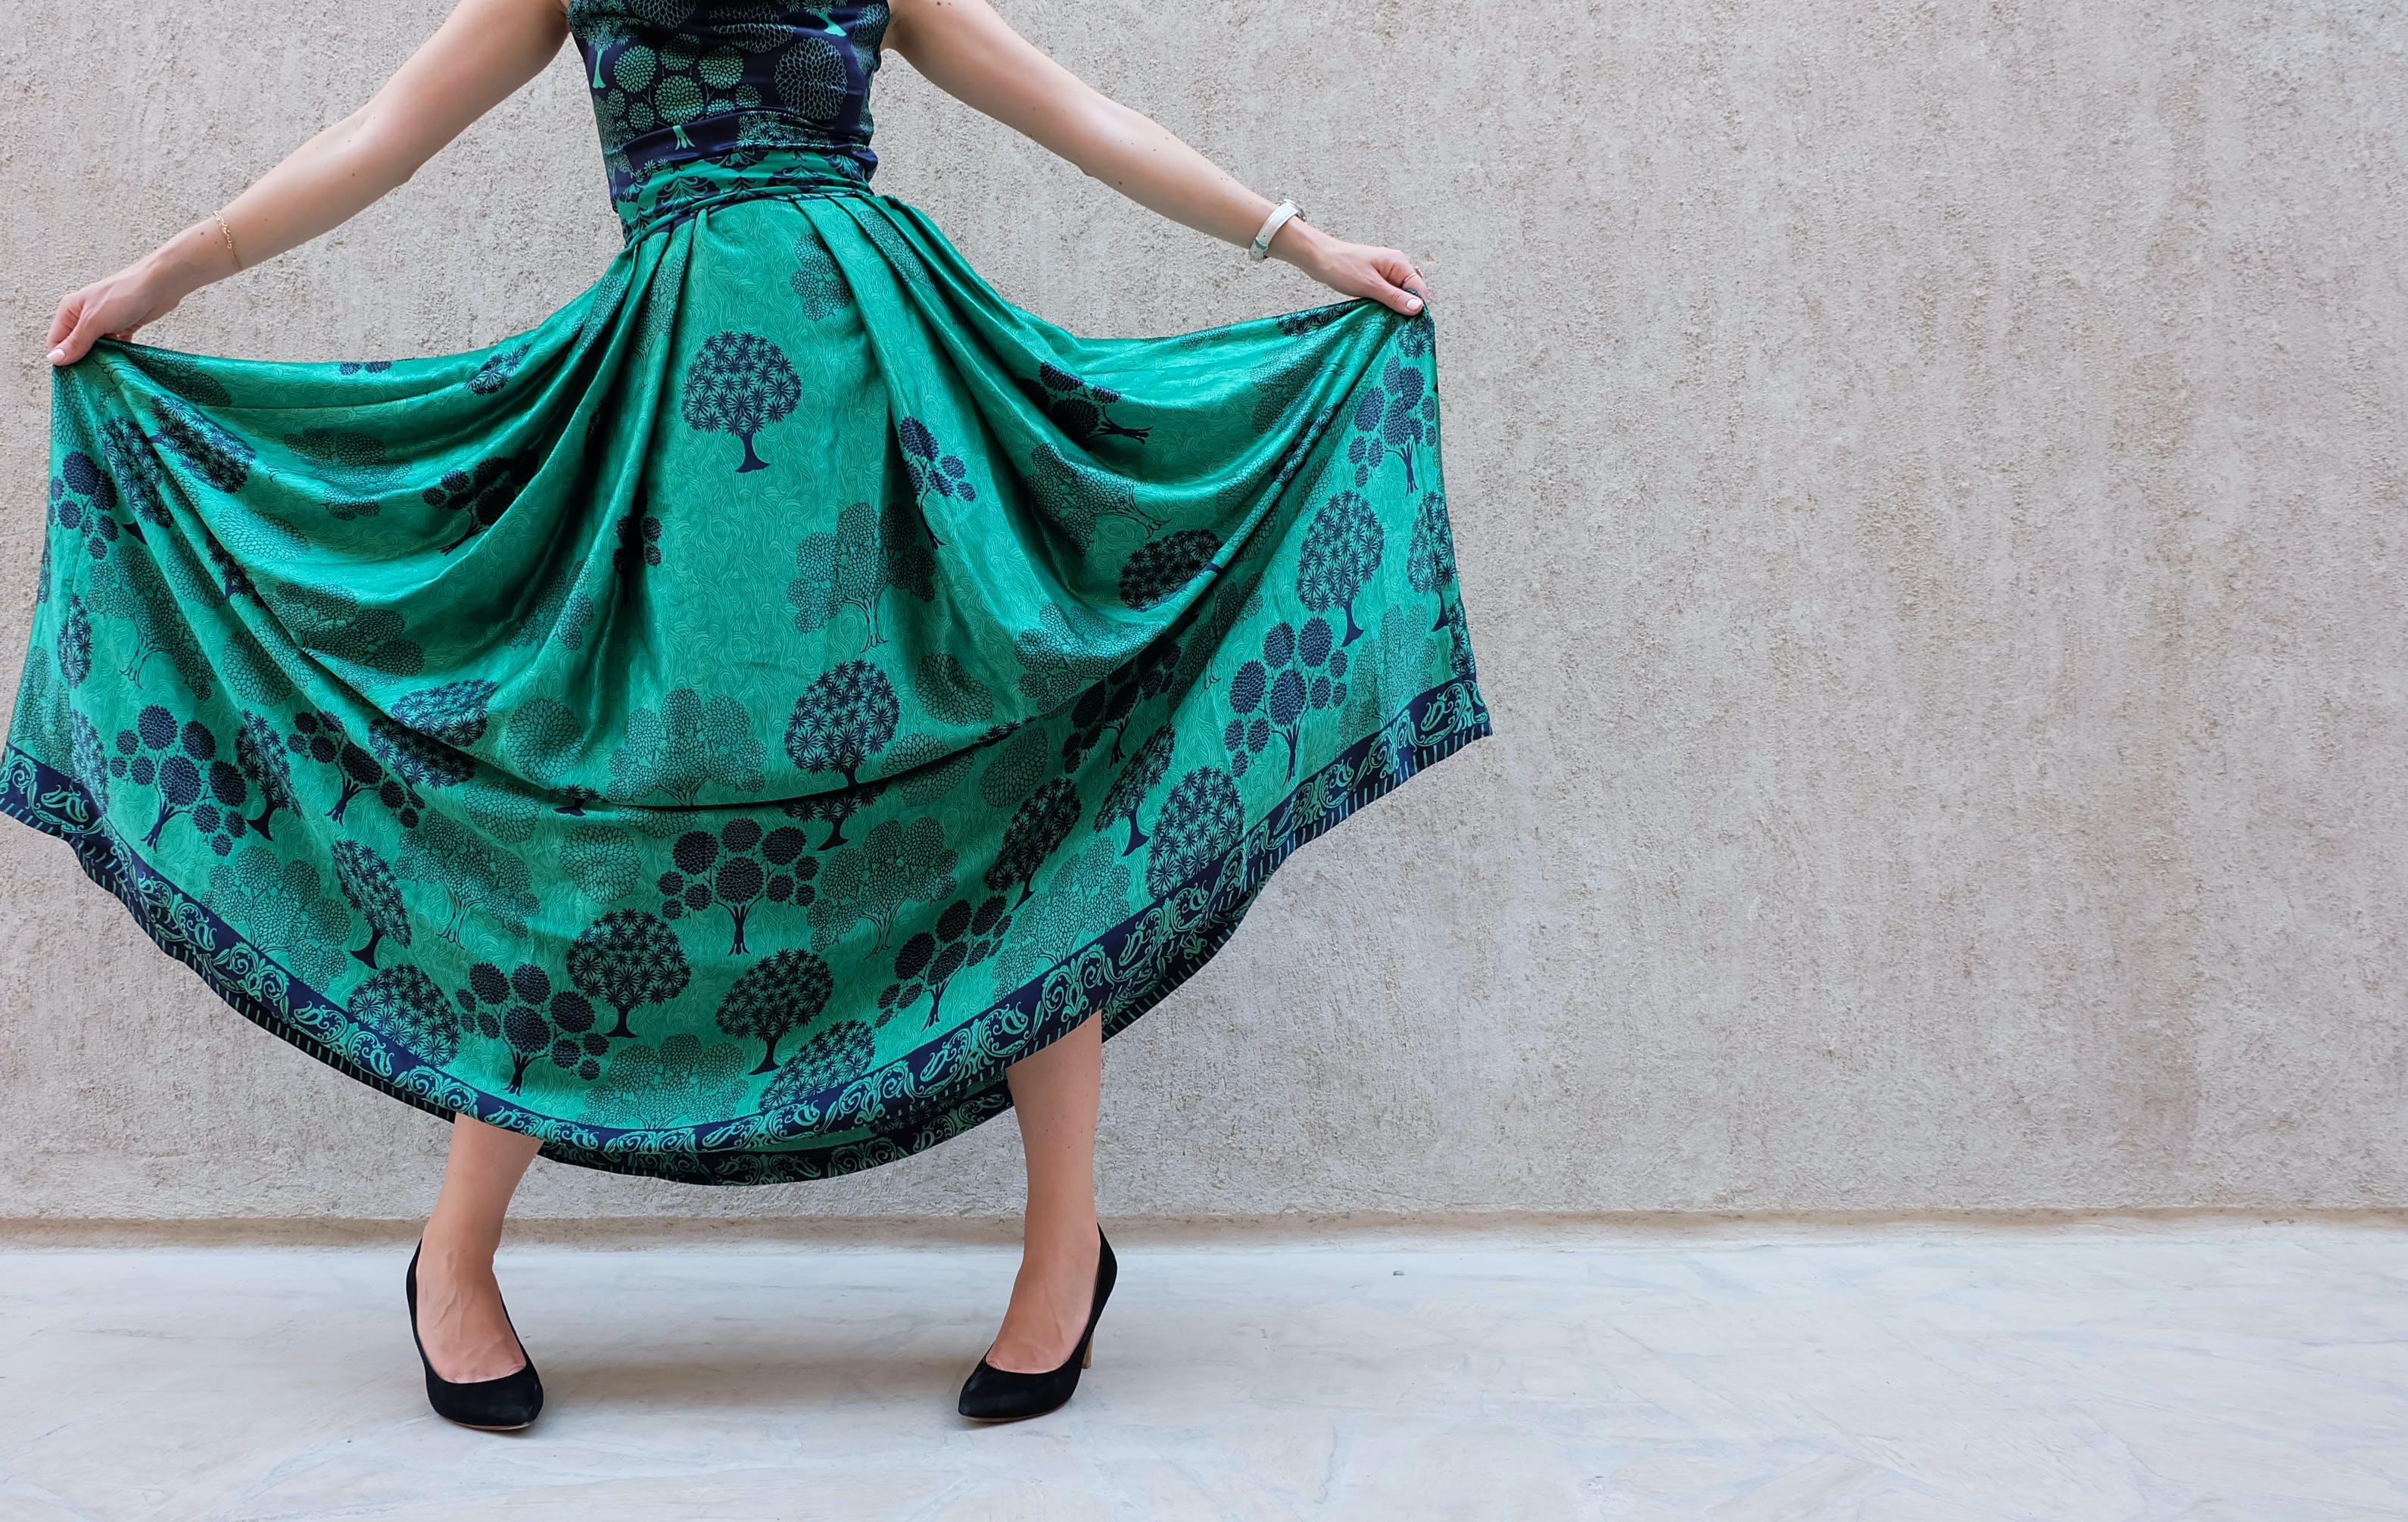 Kostenloses Stock Foto zu elegant, fashion, frau, füße